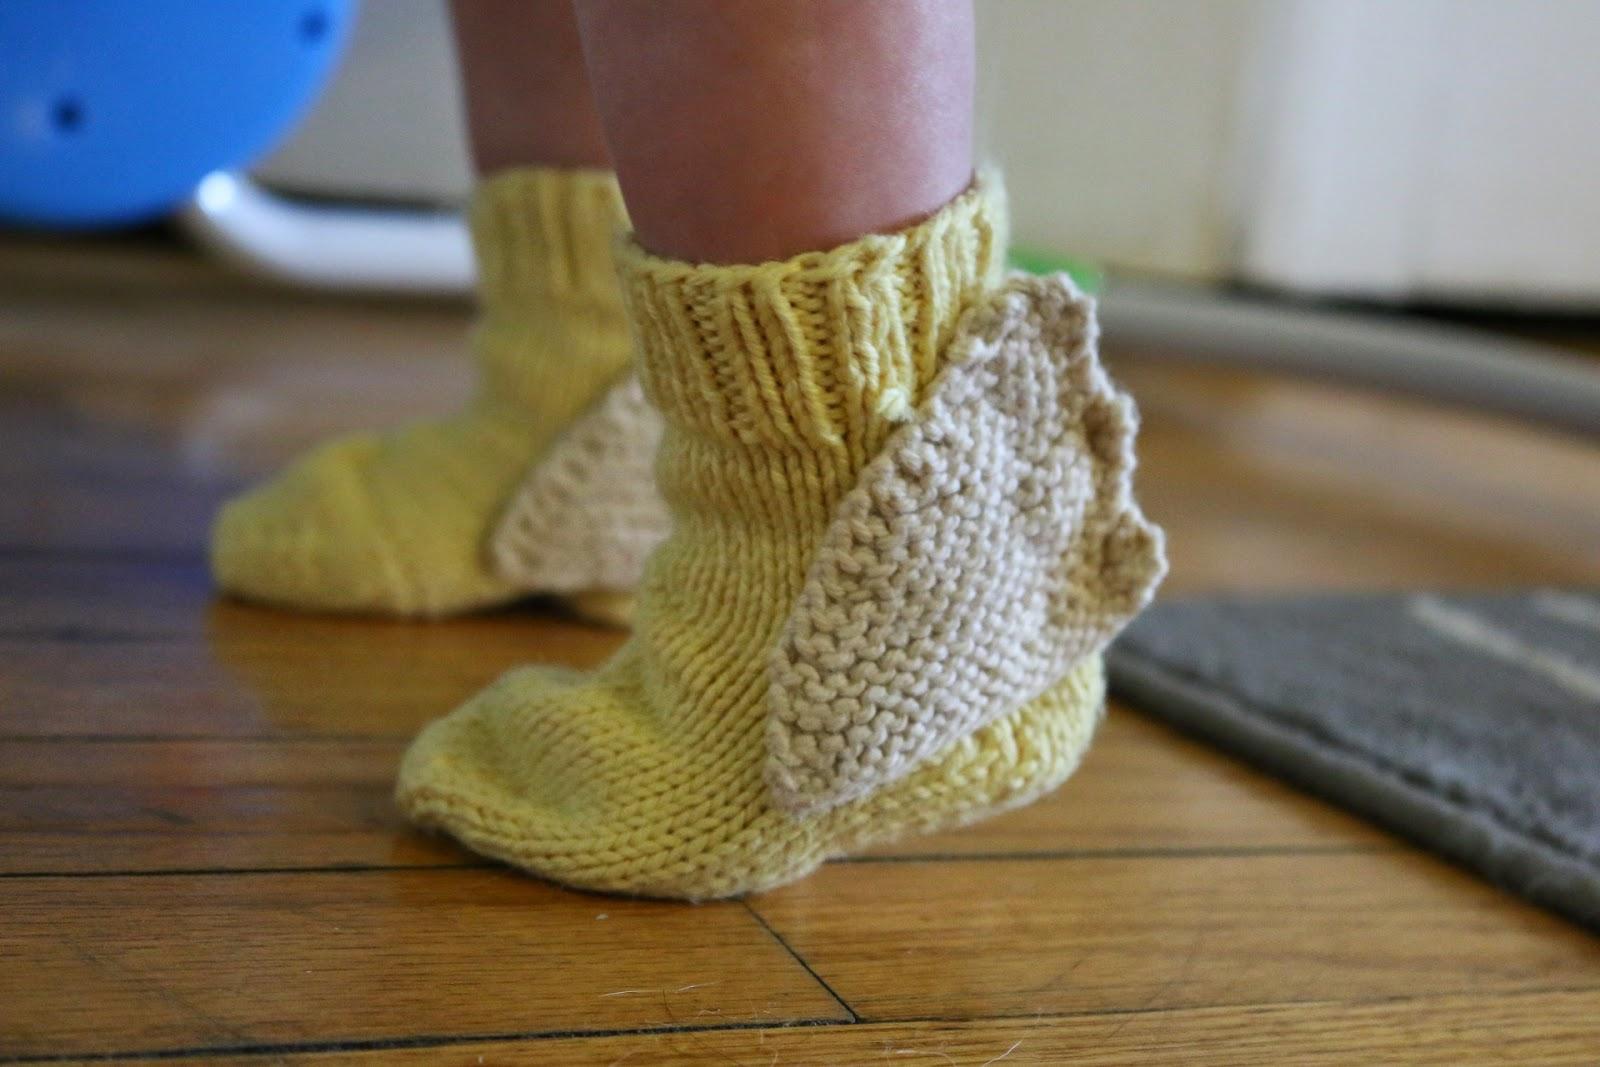 ChemKnits: Hermes Winged Baby Socks